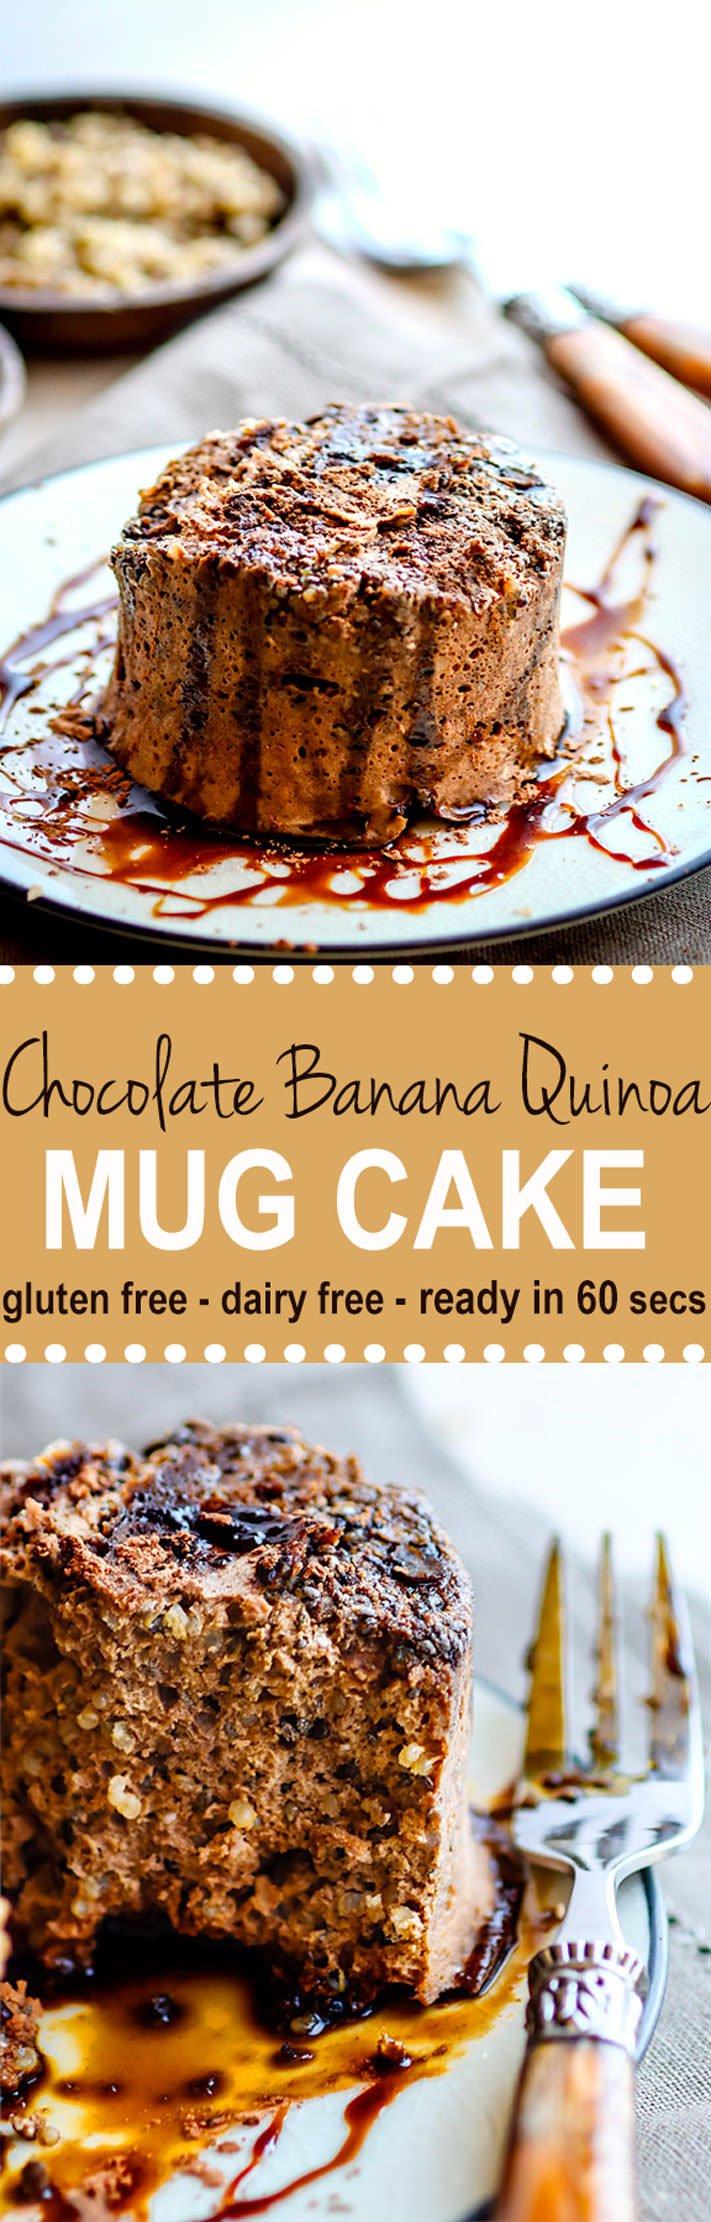 Chocolate Banana Quinoa Microwave Mug Cake | Recipe ...